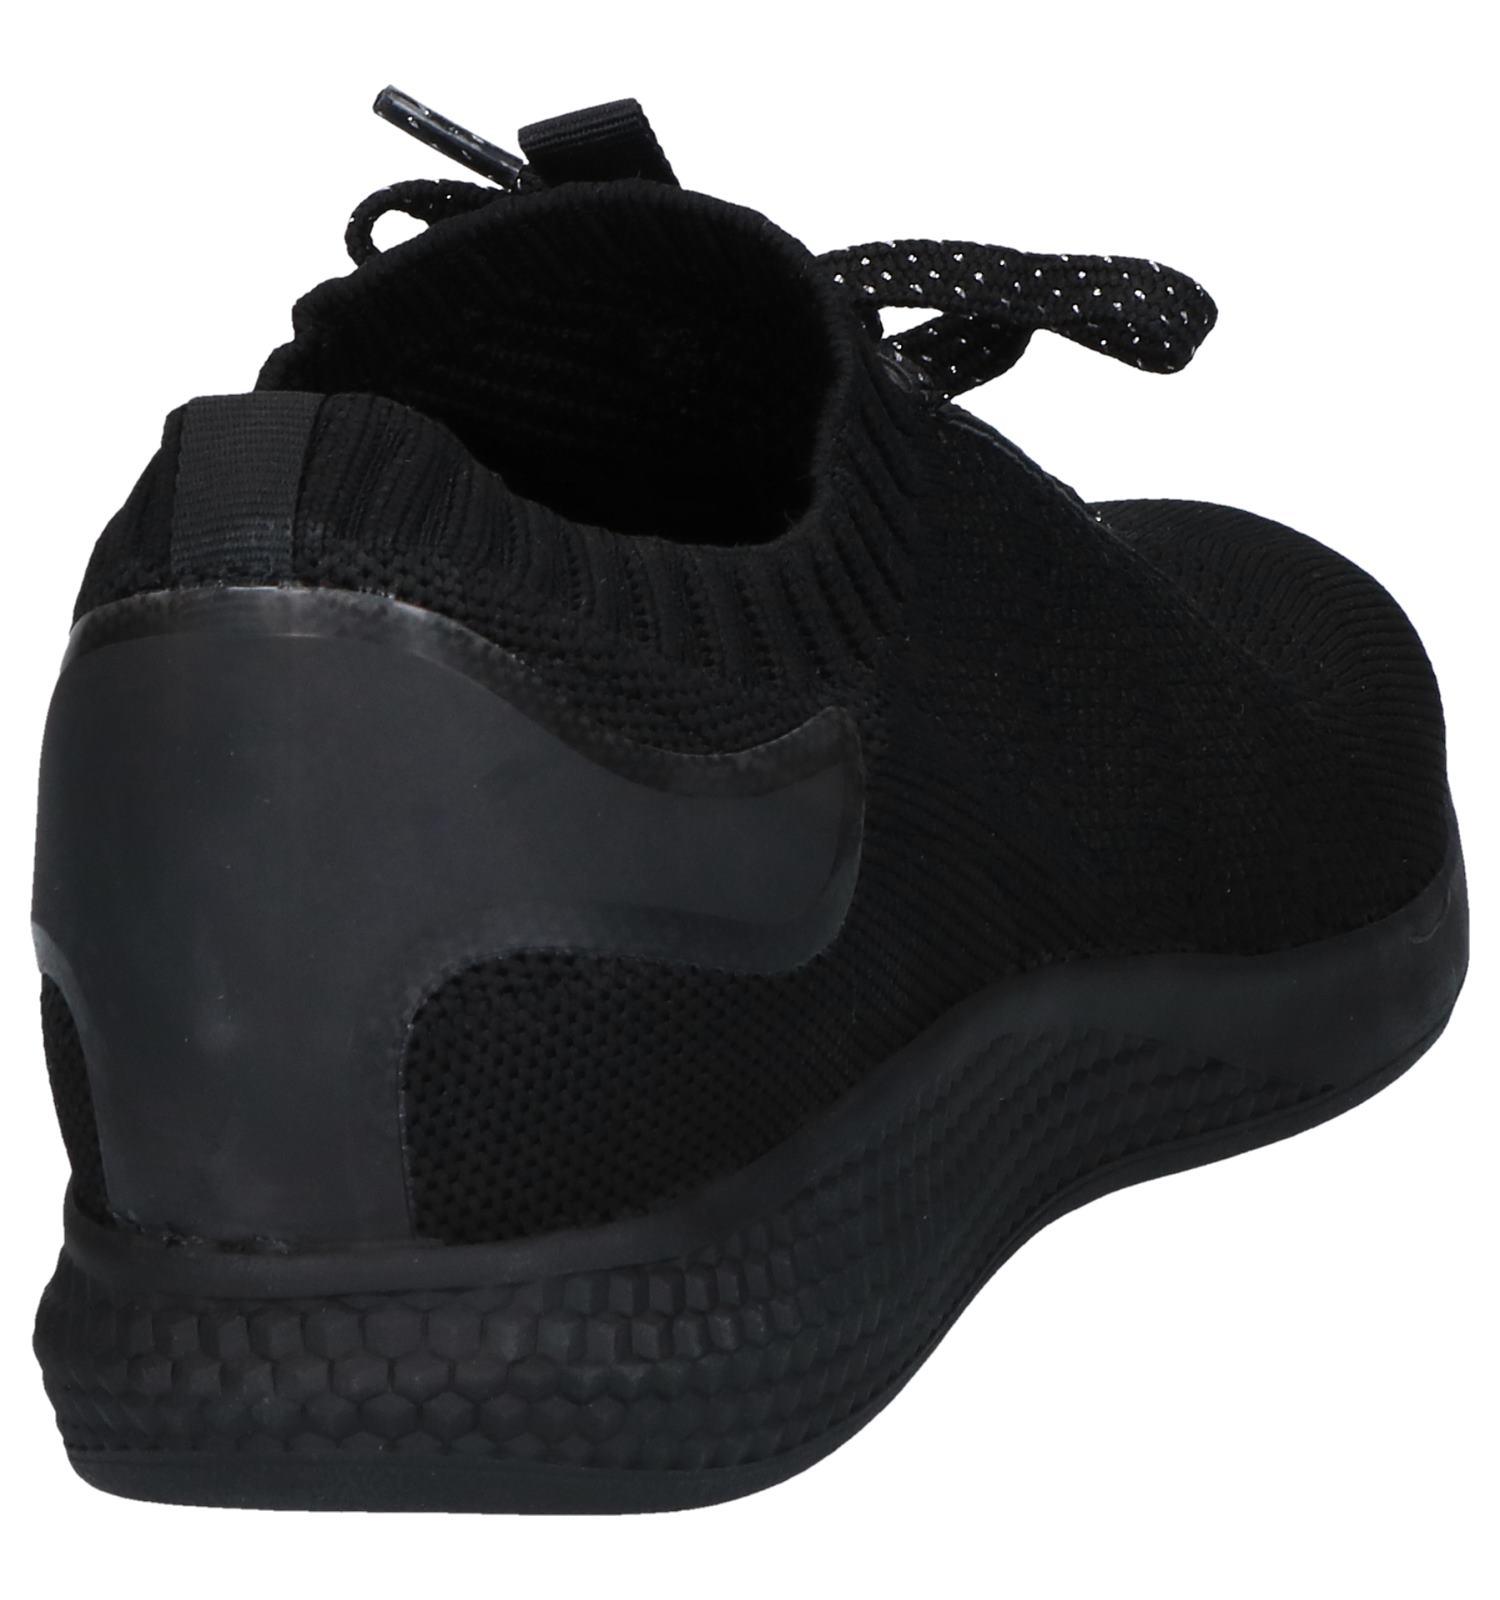 54cb70a30ce Zwarte Sneakers Dazzle   TORFS.BE   Gratis verzend en retour